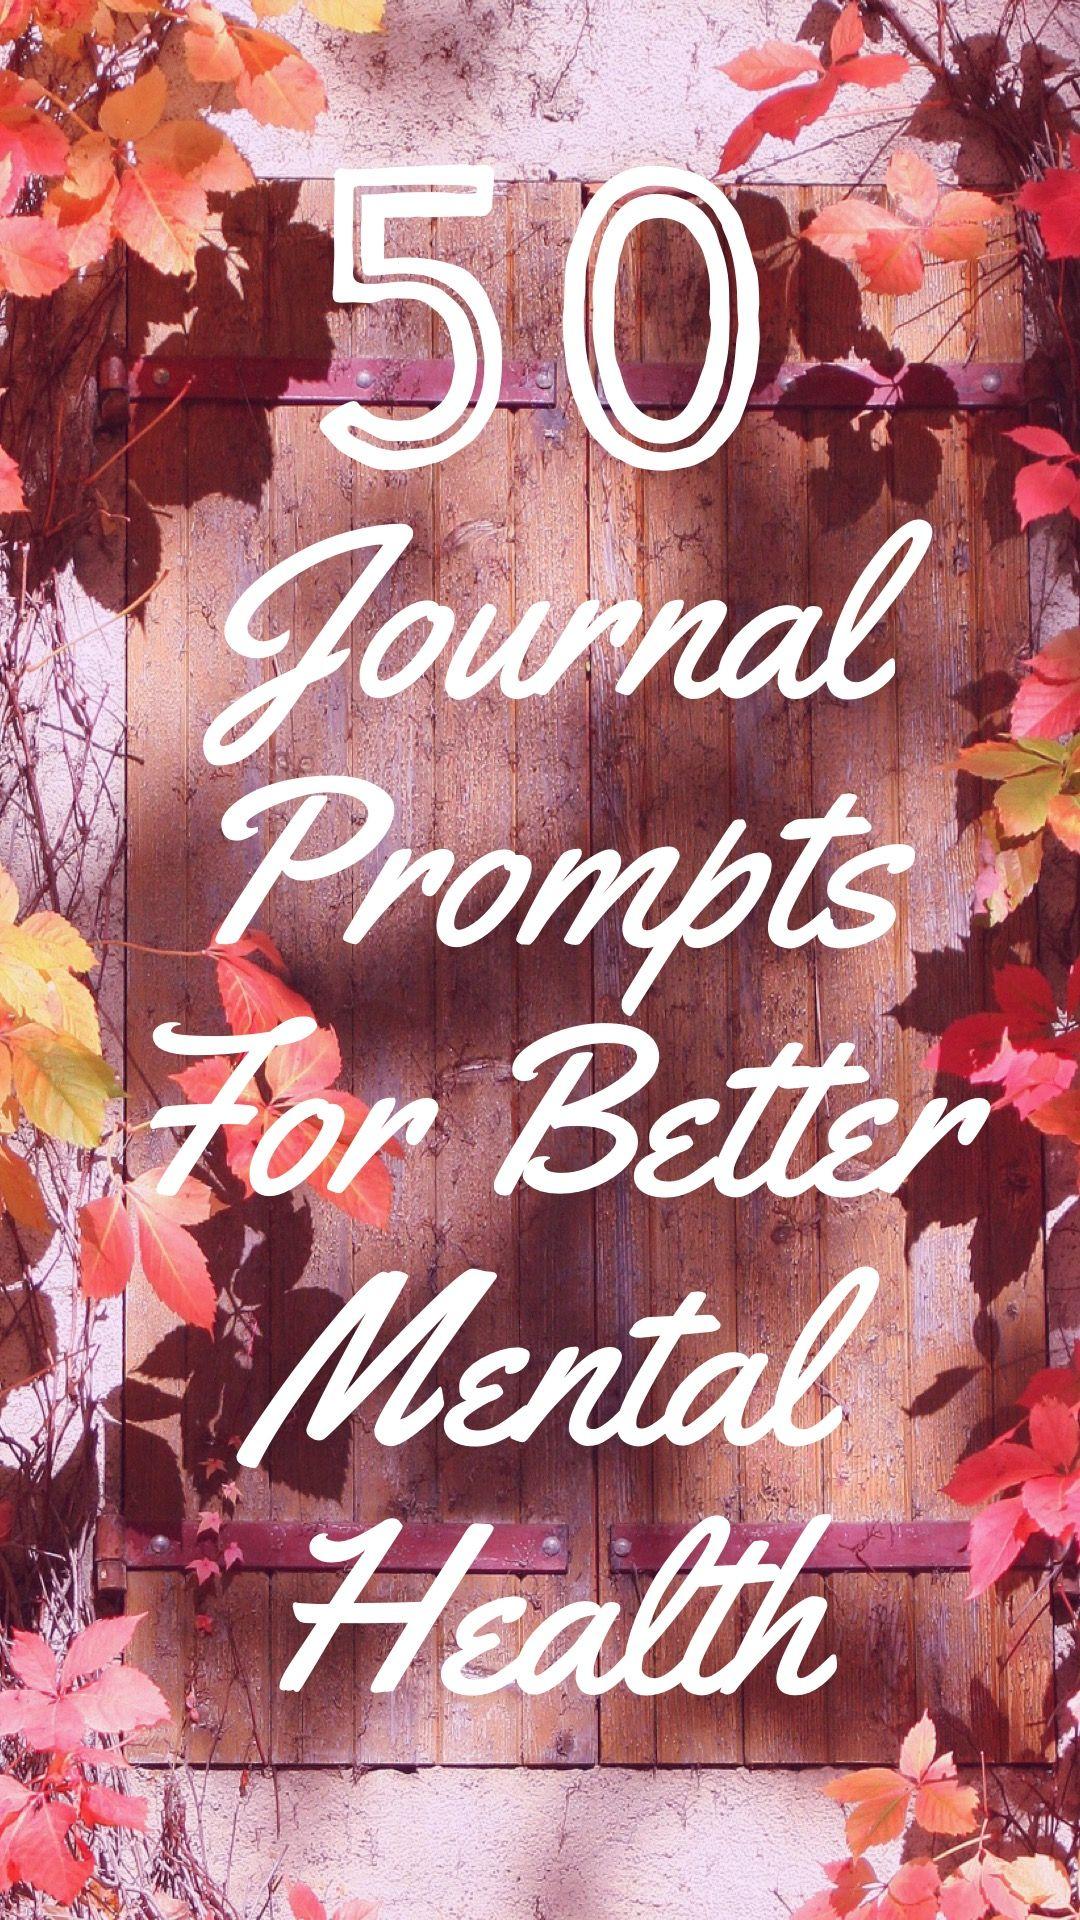 50 Journal Prompts For Mental Health #mentalhealthjournal